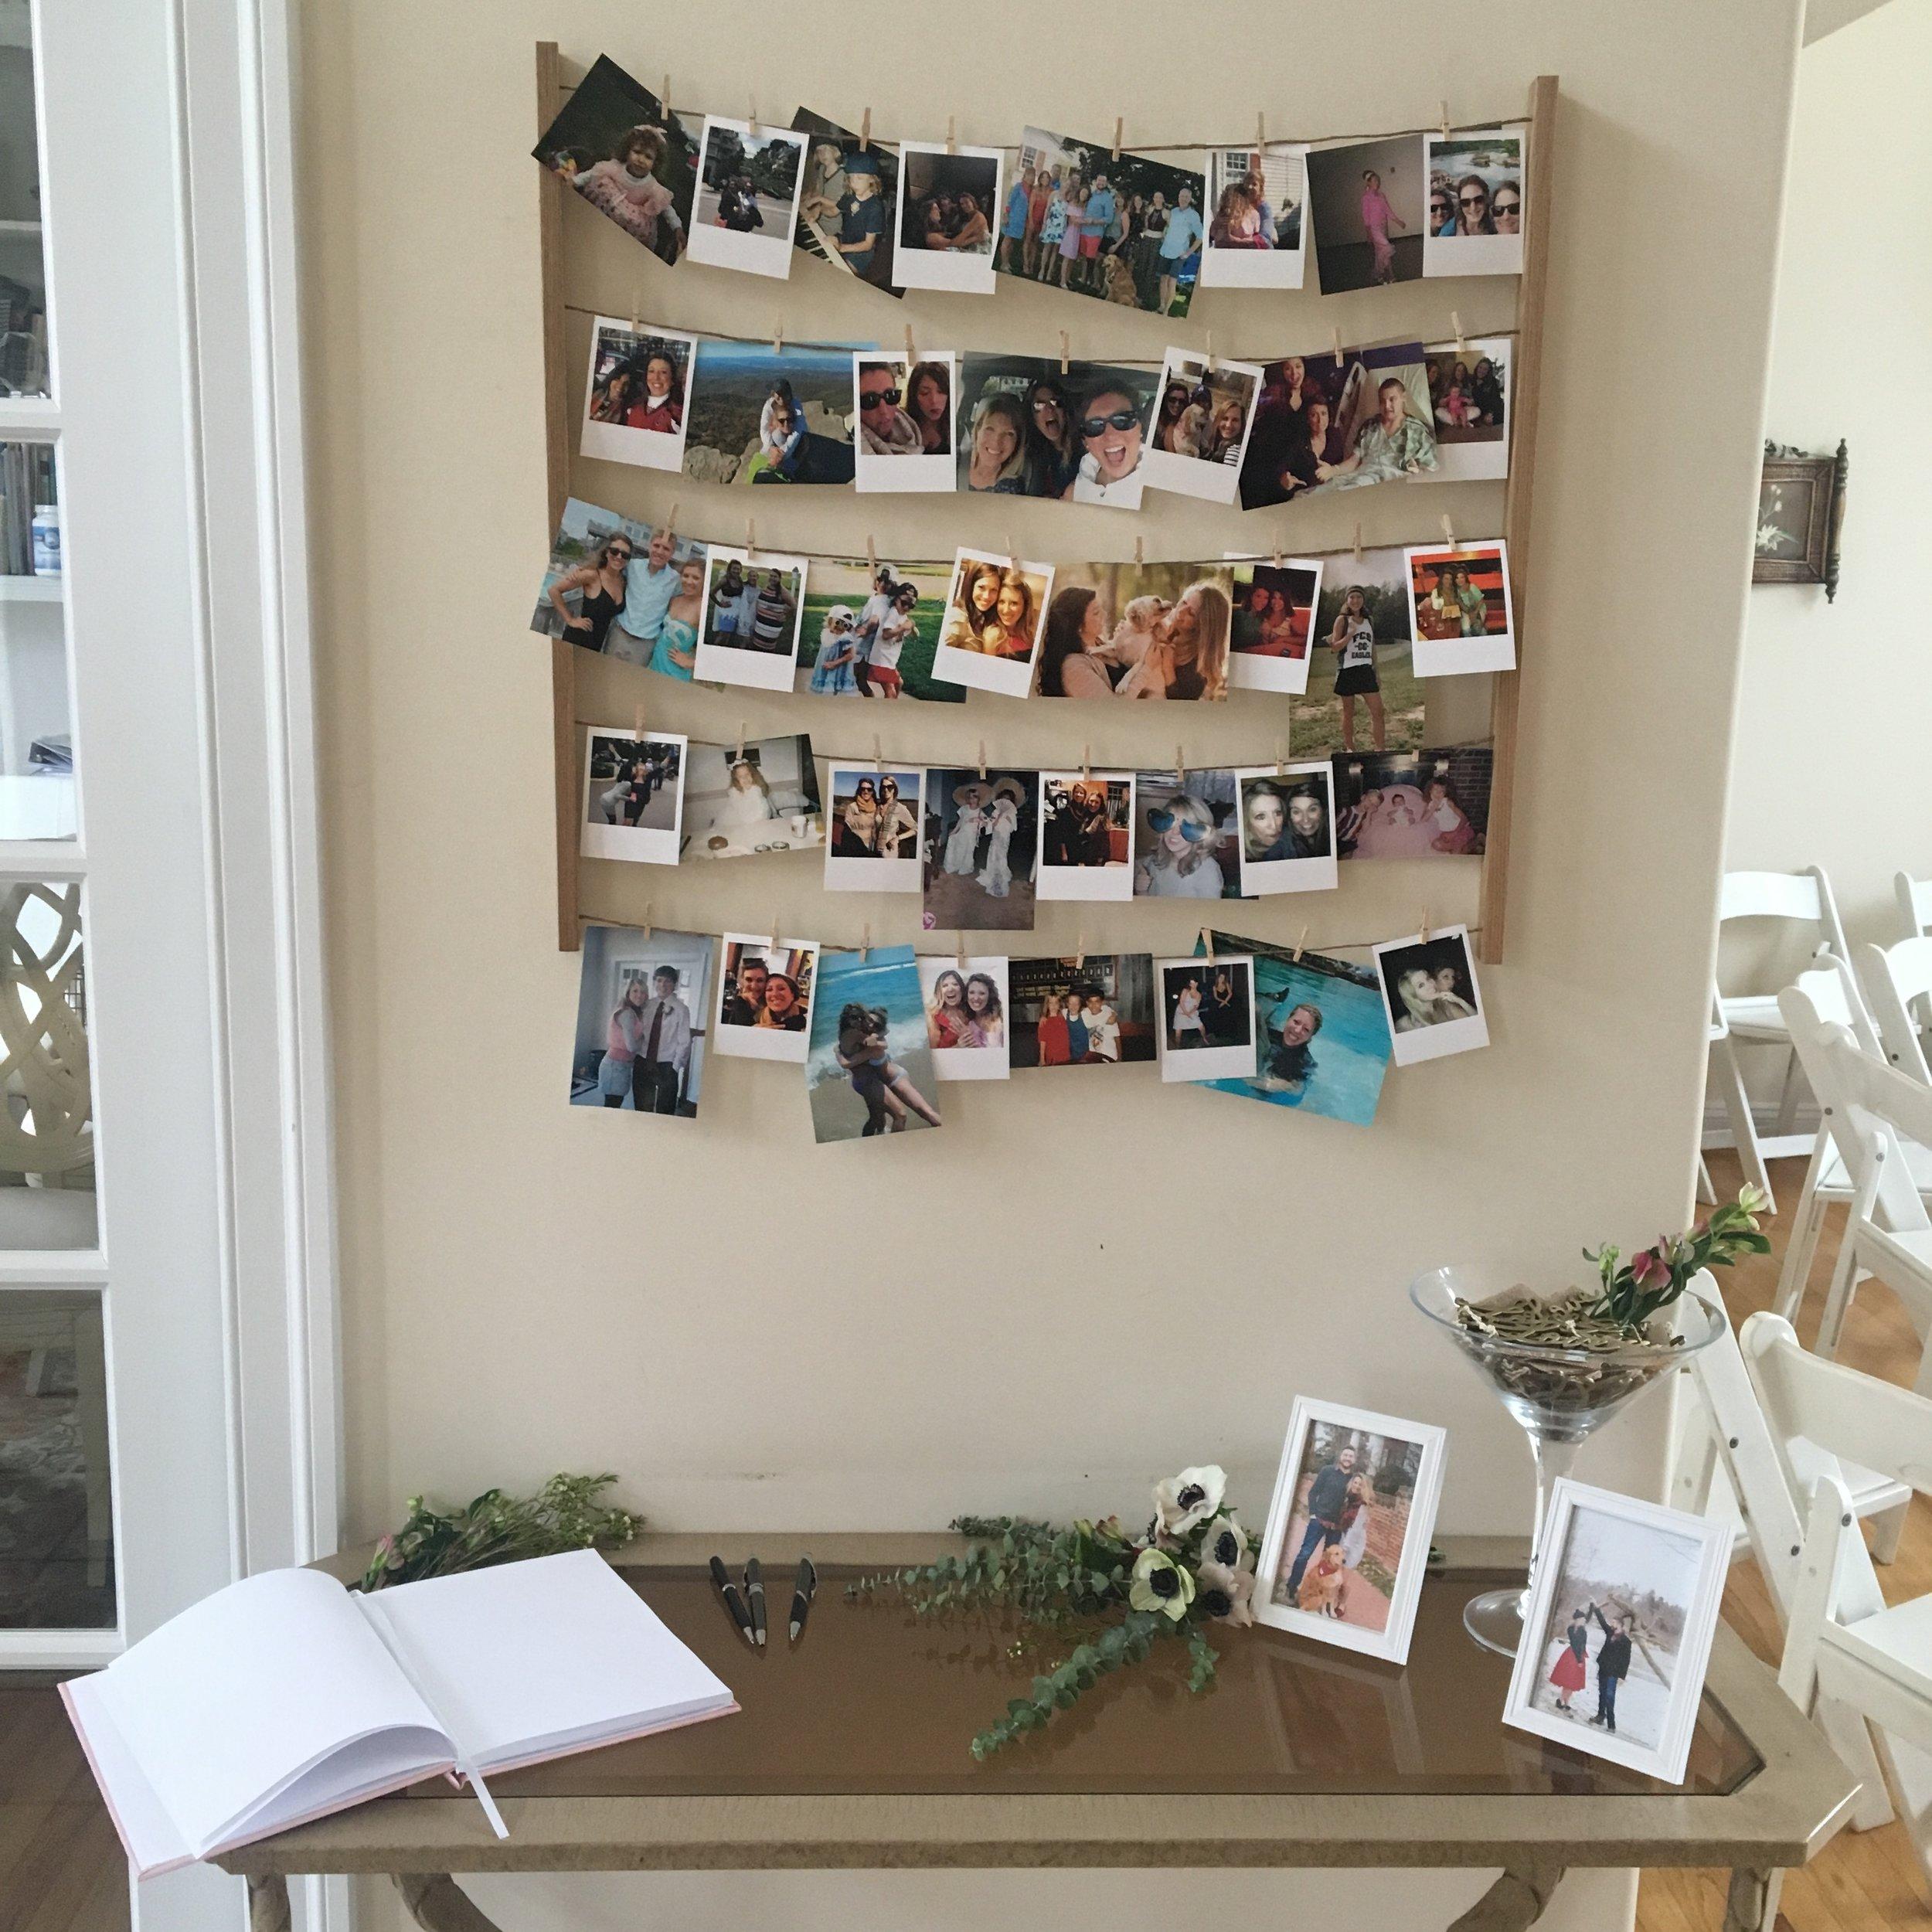 such a fun board of photo memories!